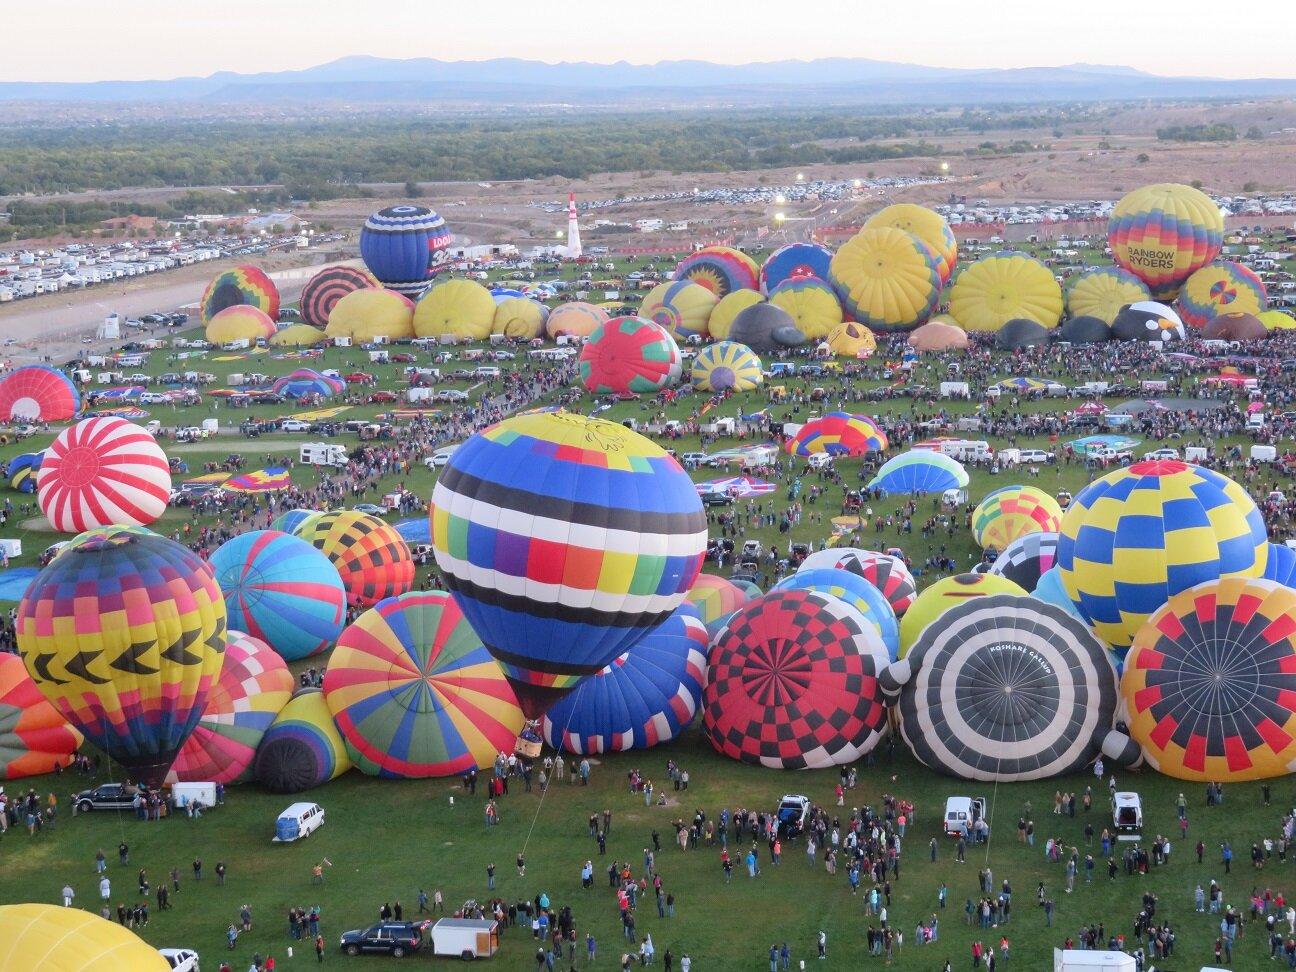 View of Fiesta Park from aloft